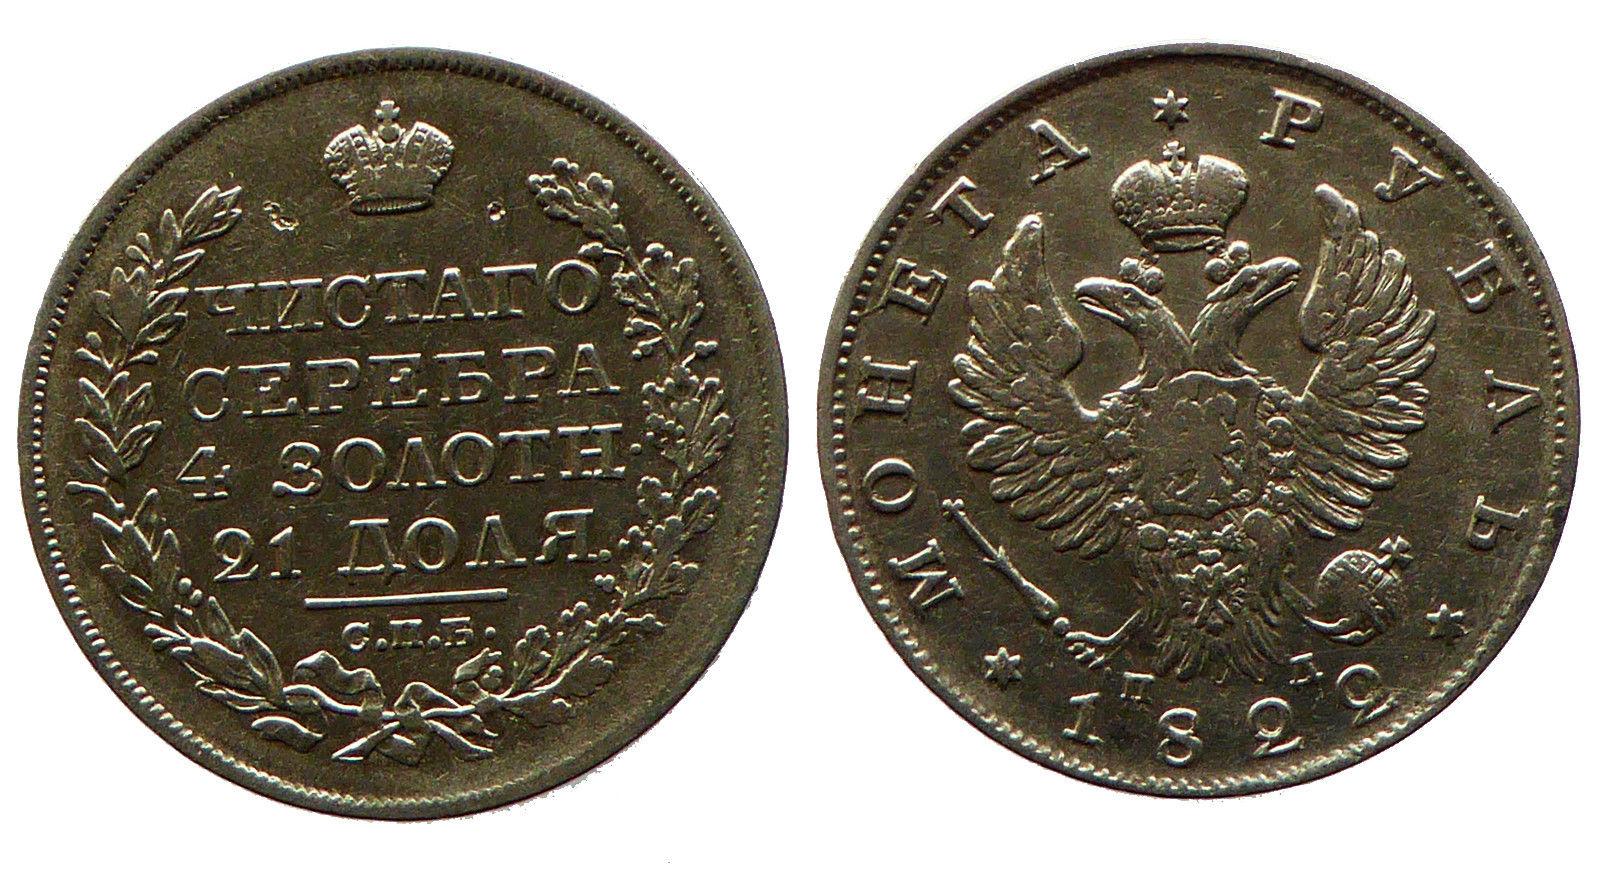 1 rub 1822 alex 150 eu